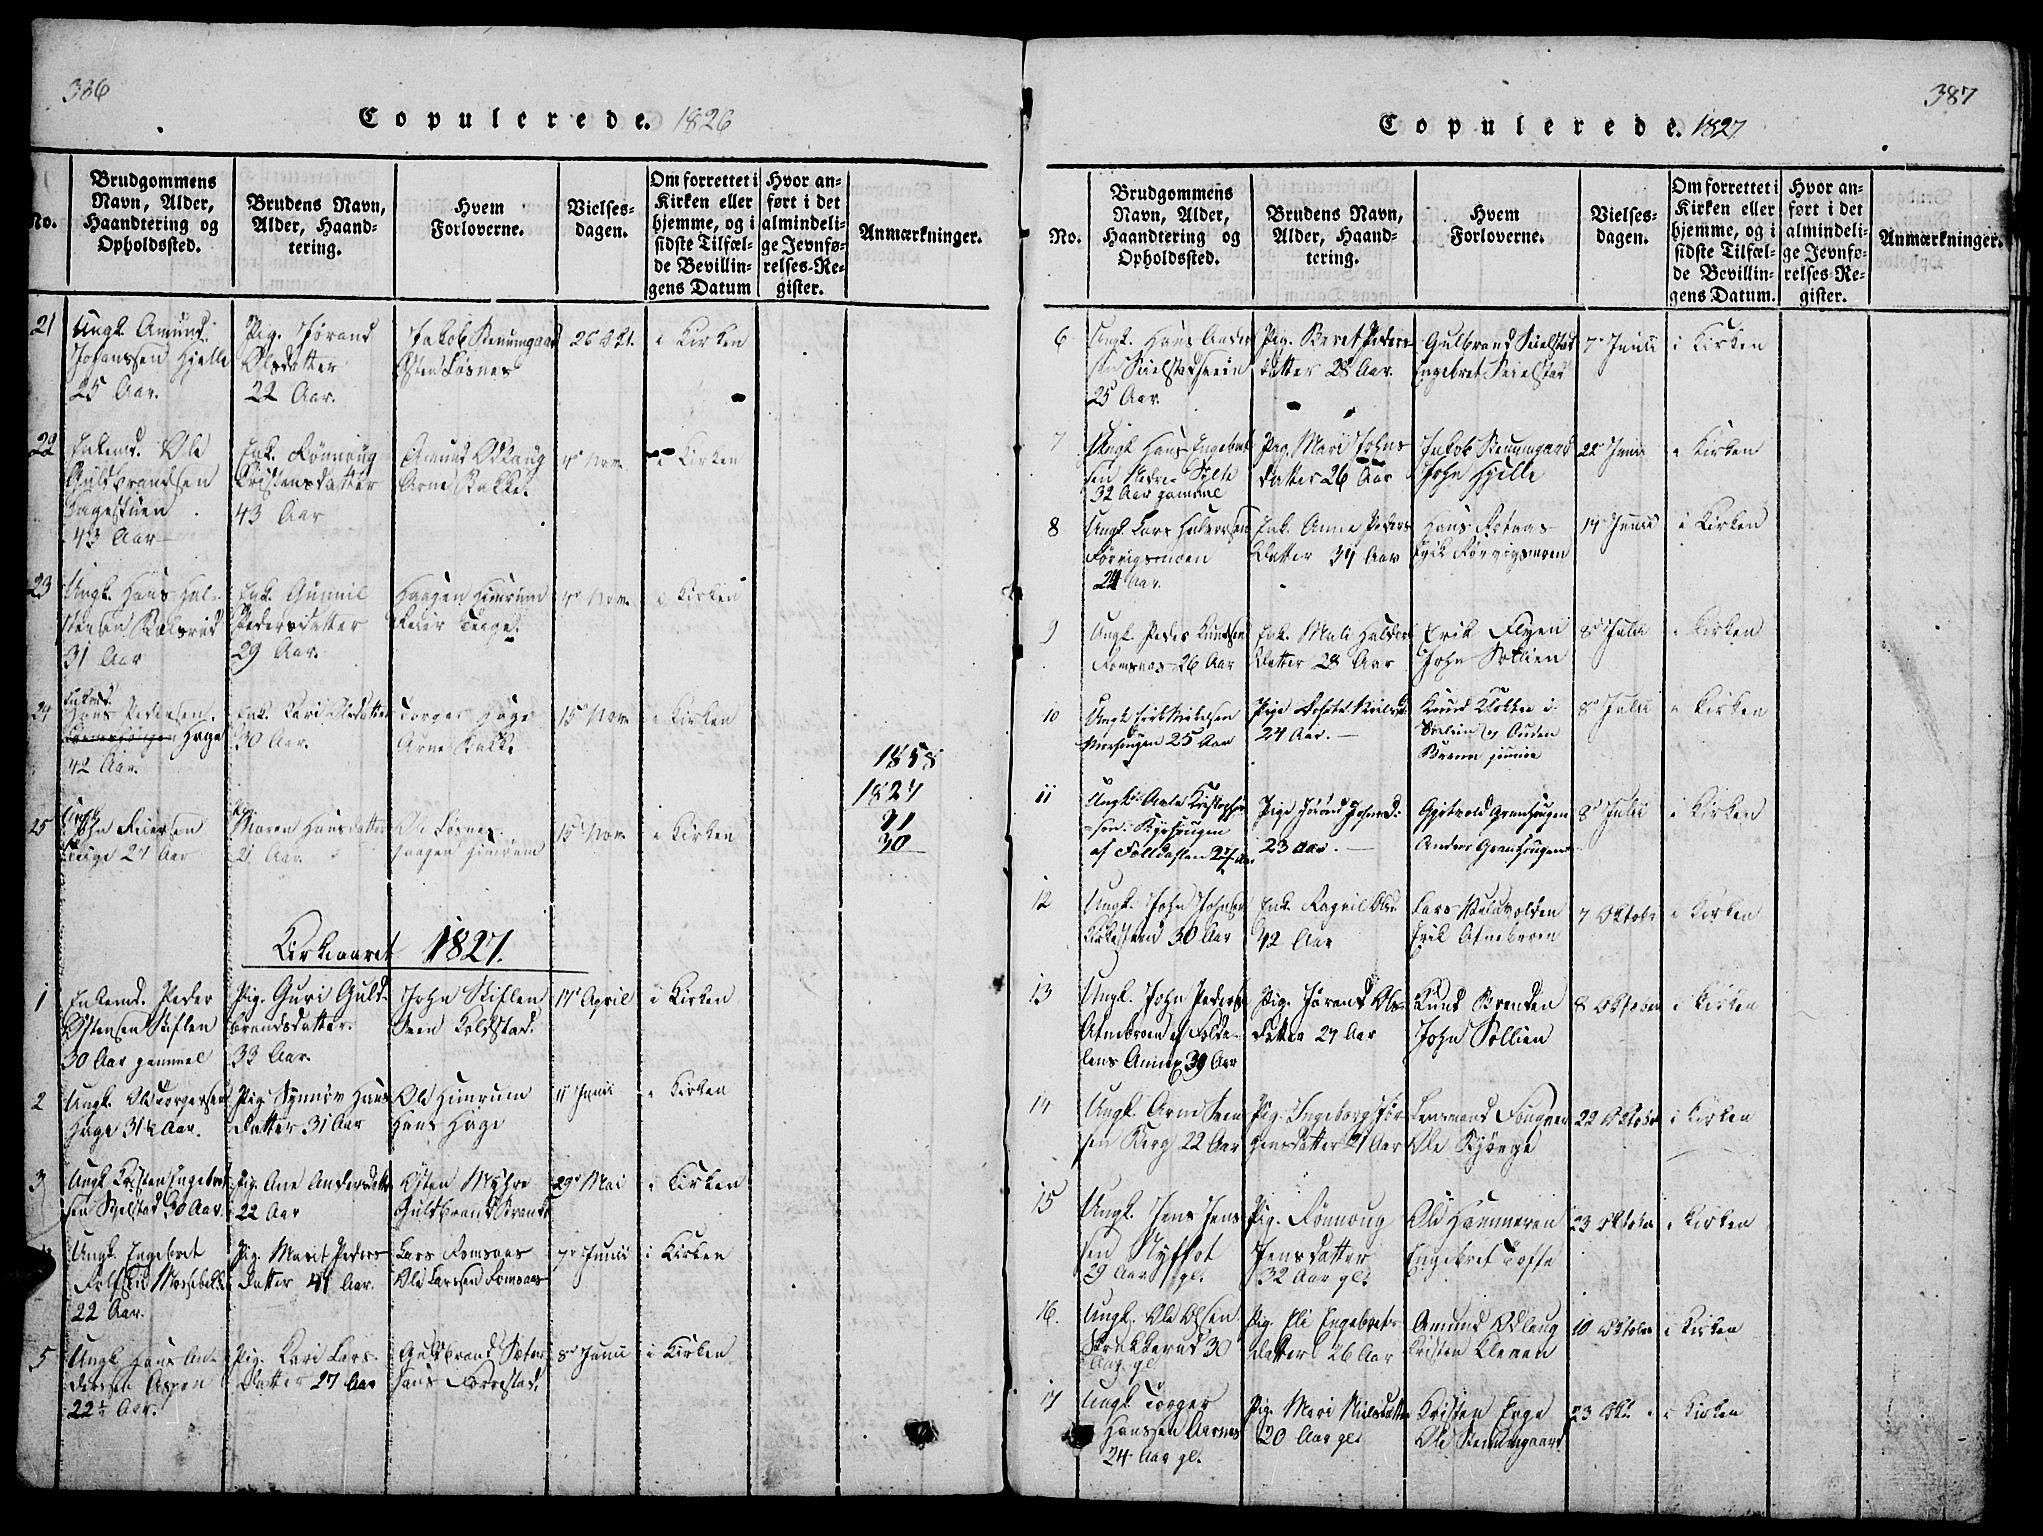 SAH, Ringebu prestekontor, Klokkerbok nr. 1, 1821-1839, s. 386-387